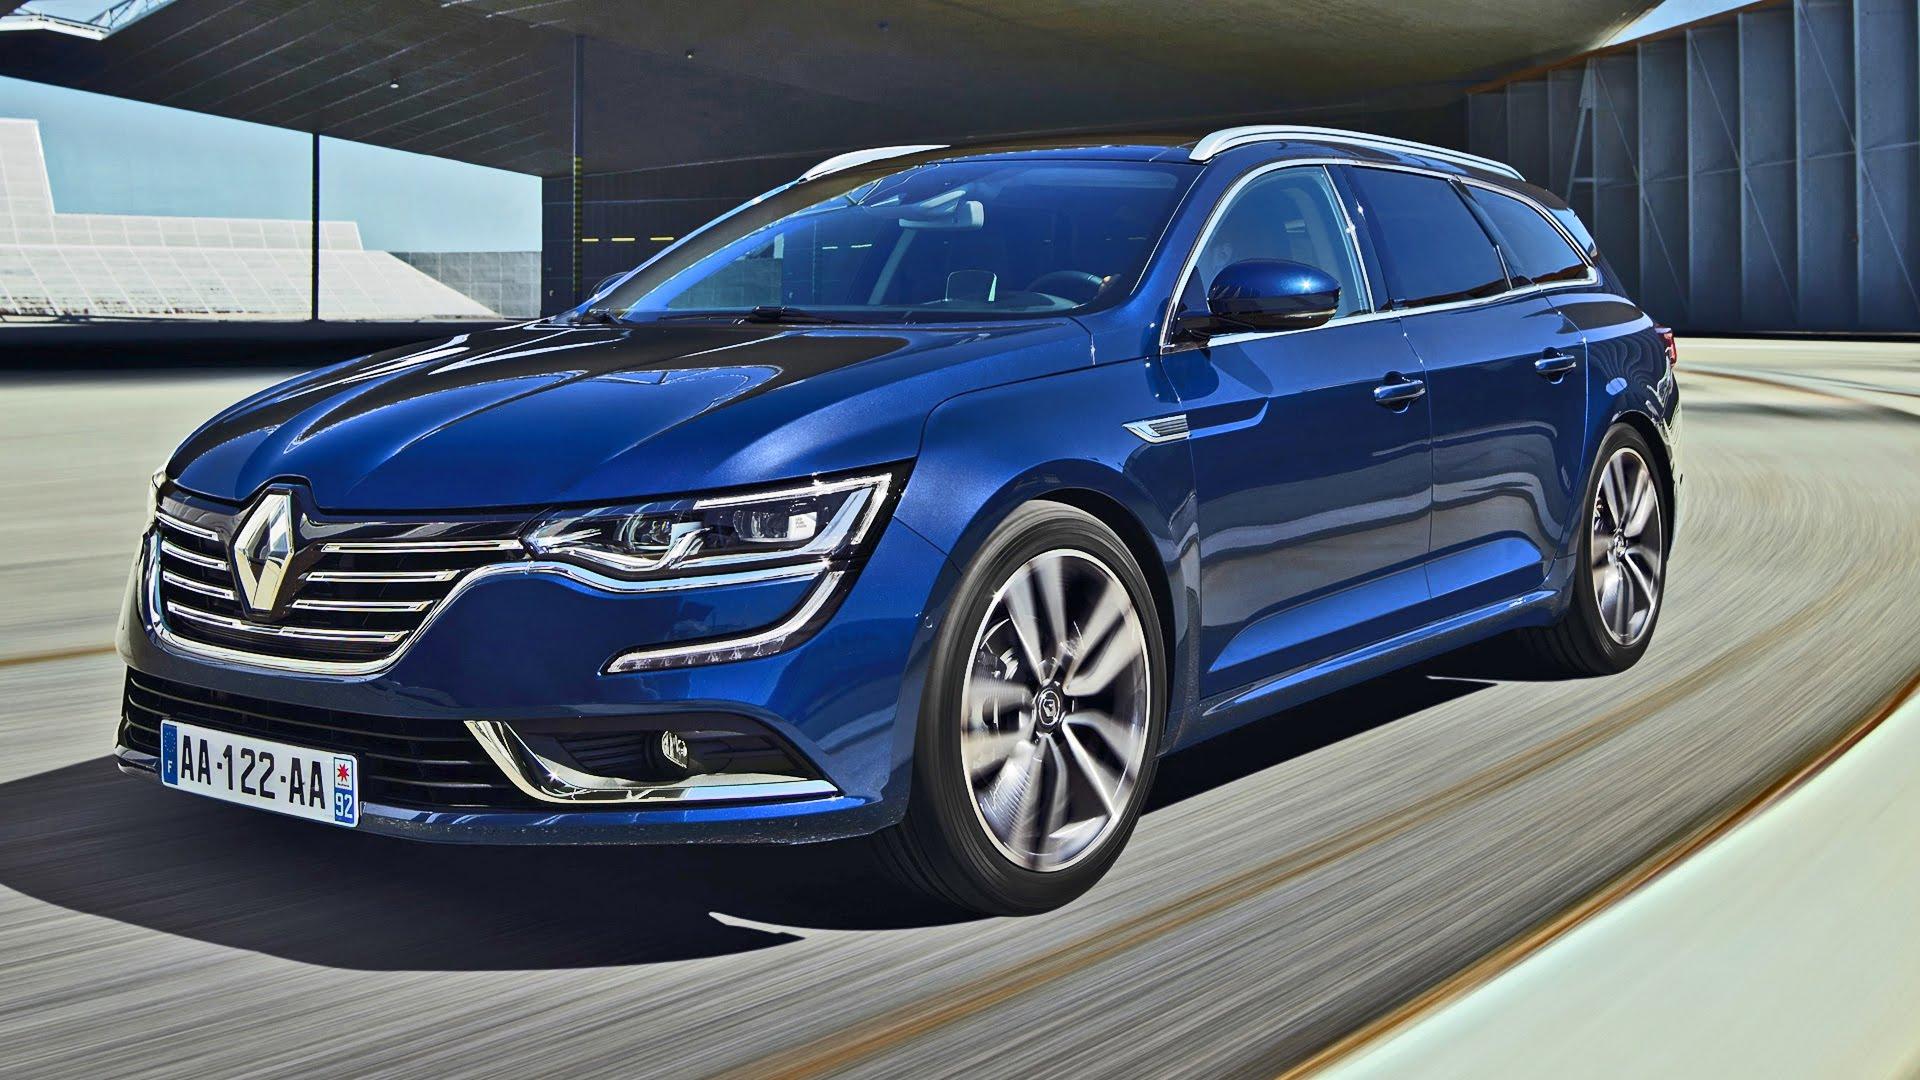 2016 Renault Talisman Renk Seçenekleri